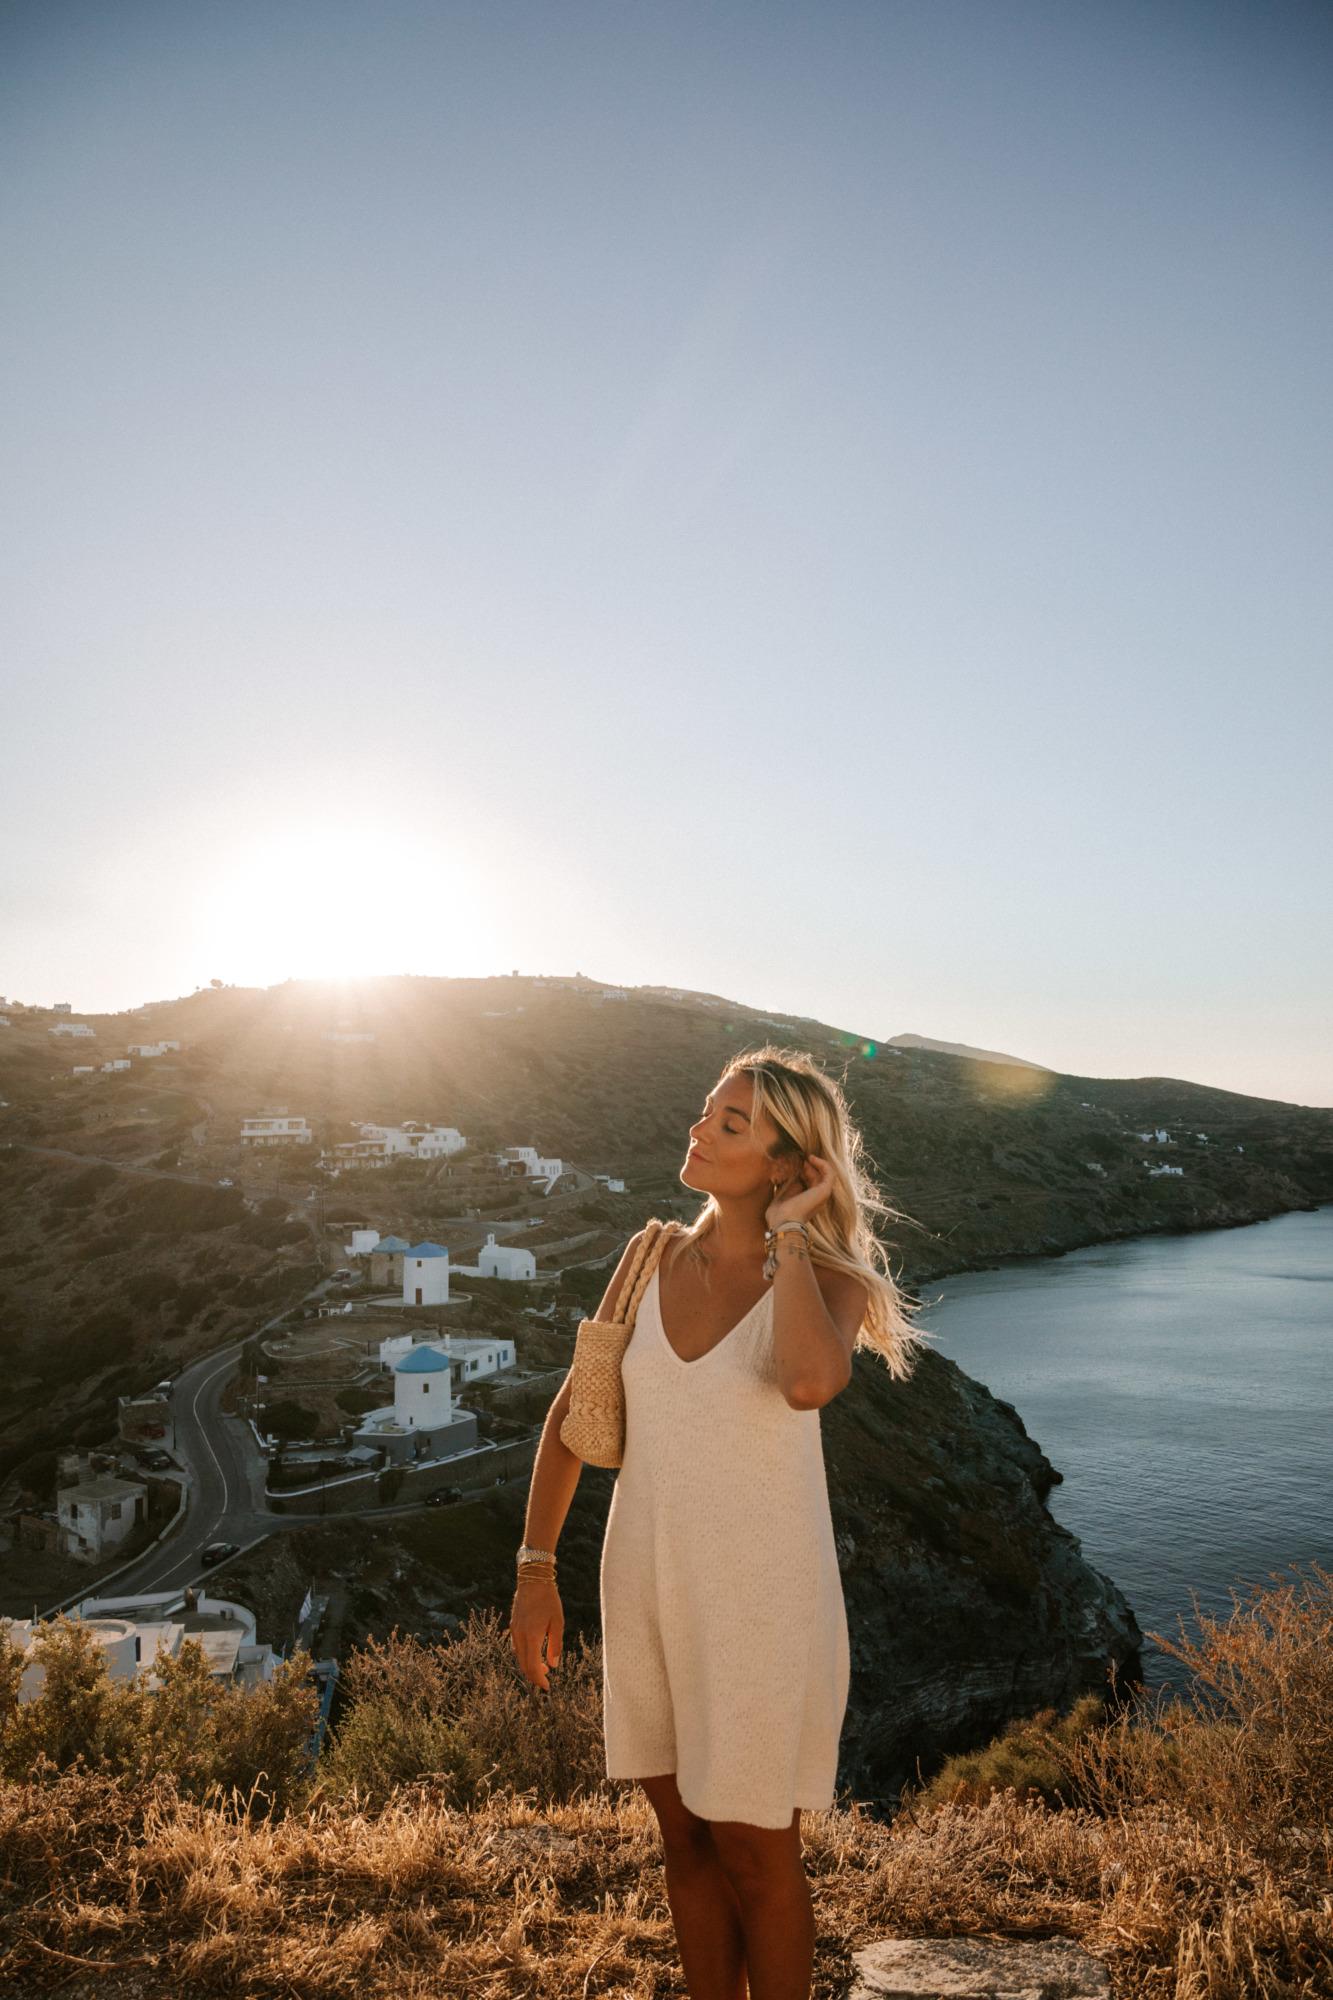 Visiter Kastro Sifnos Grèce - Blondie Baby blog voyages